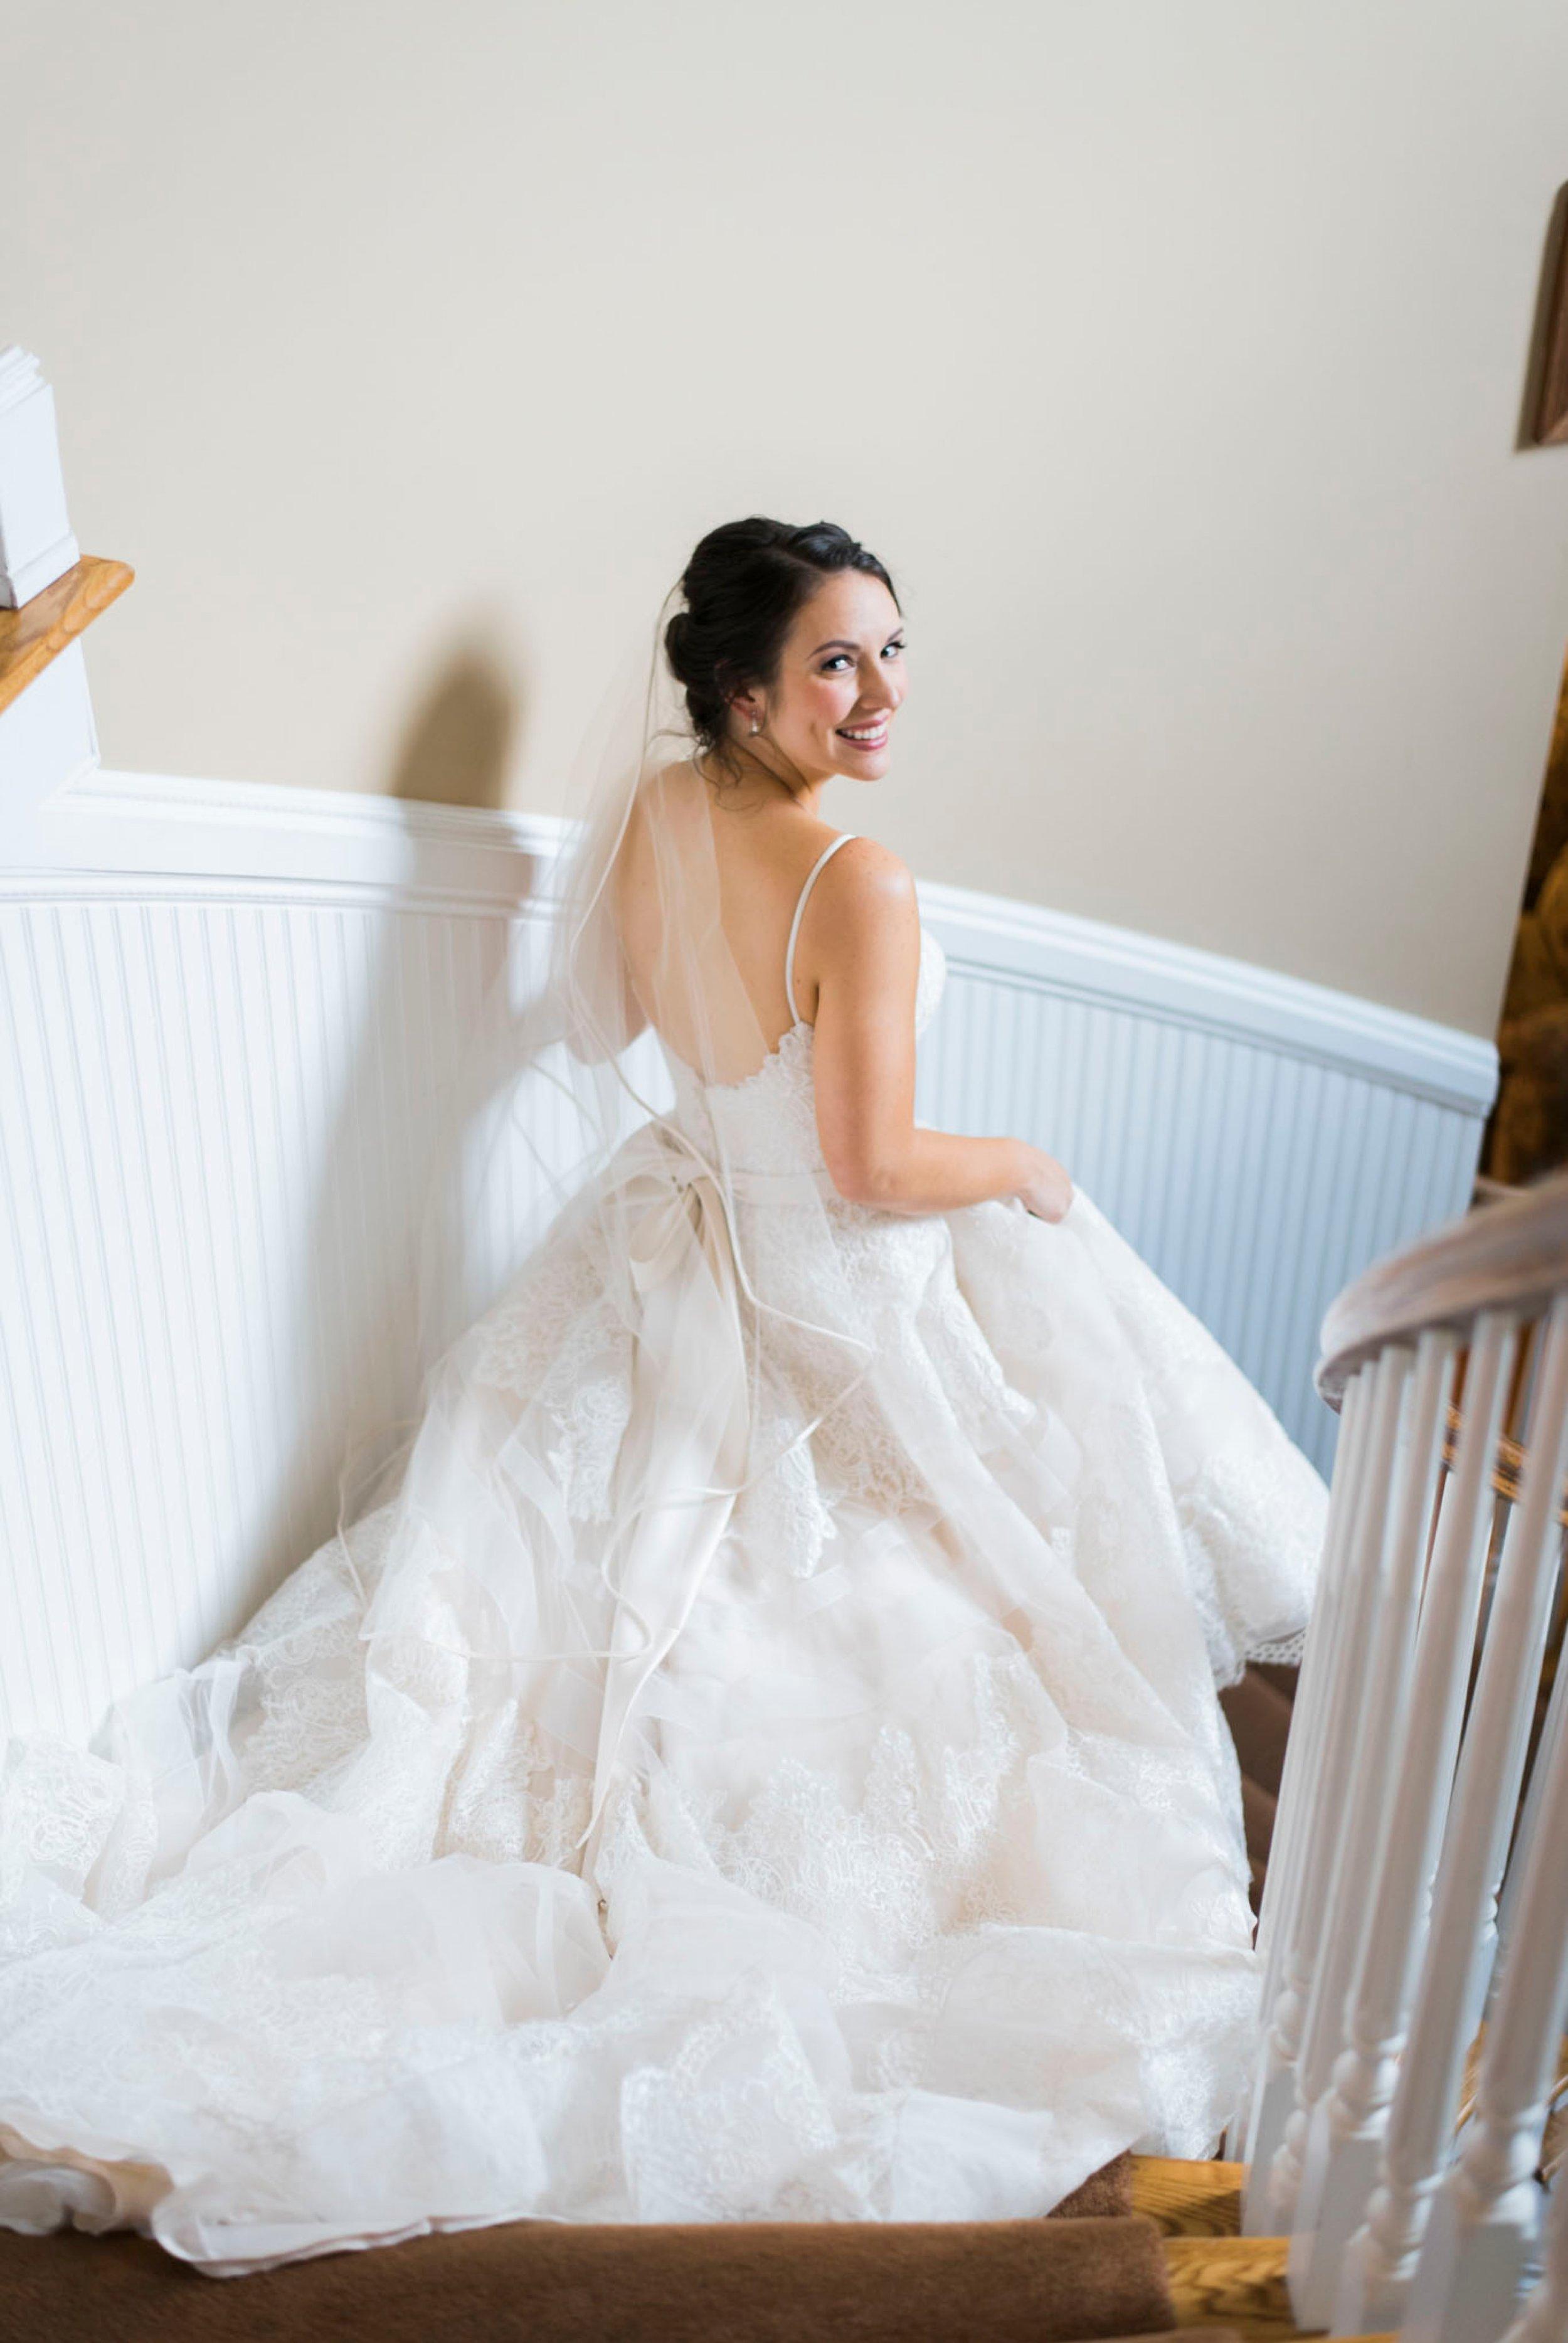 IrvineEstate_LexingtonVA_Wedding_FallWedding_VirginiaWeddingPhotographer 35.jpg